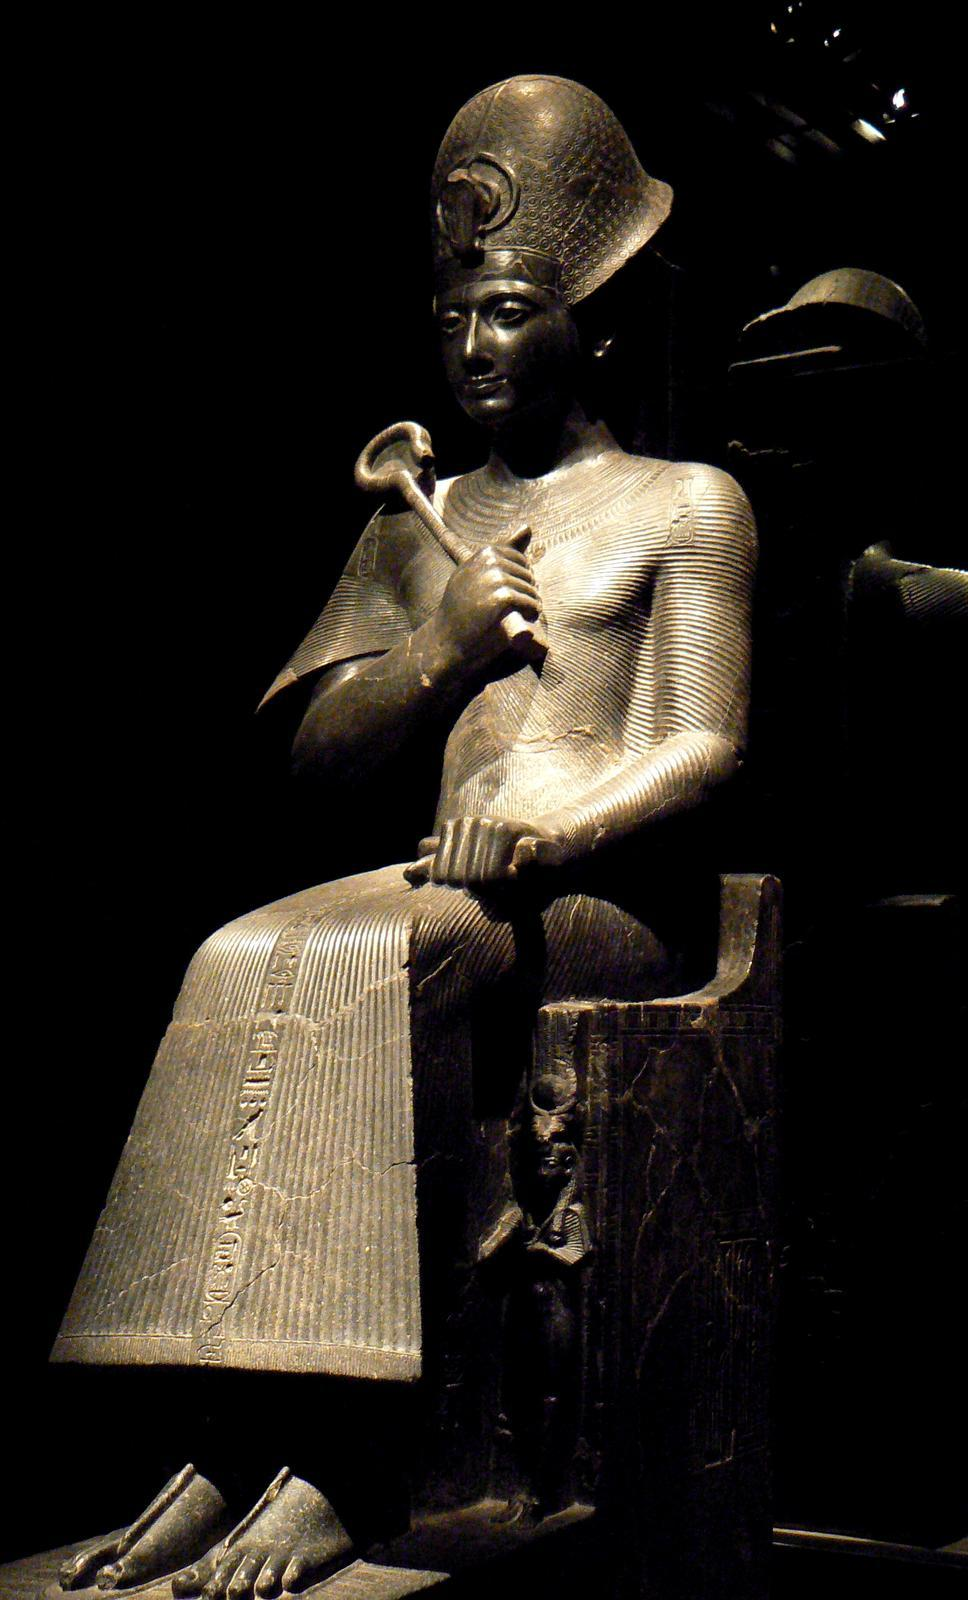 Pharaon Ancien Porteur Du Titre : pharaon, ancien, porteur, titre, Pharaon, Wikipédia